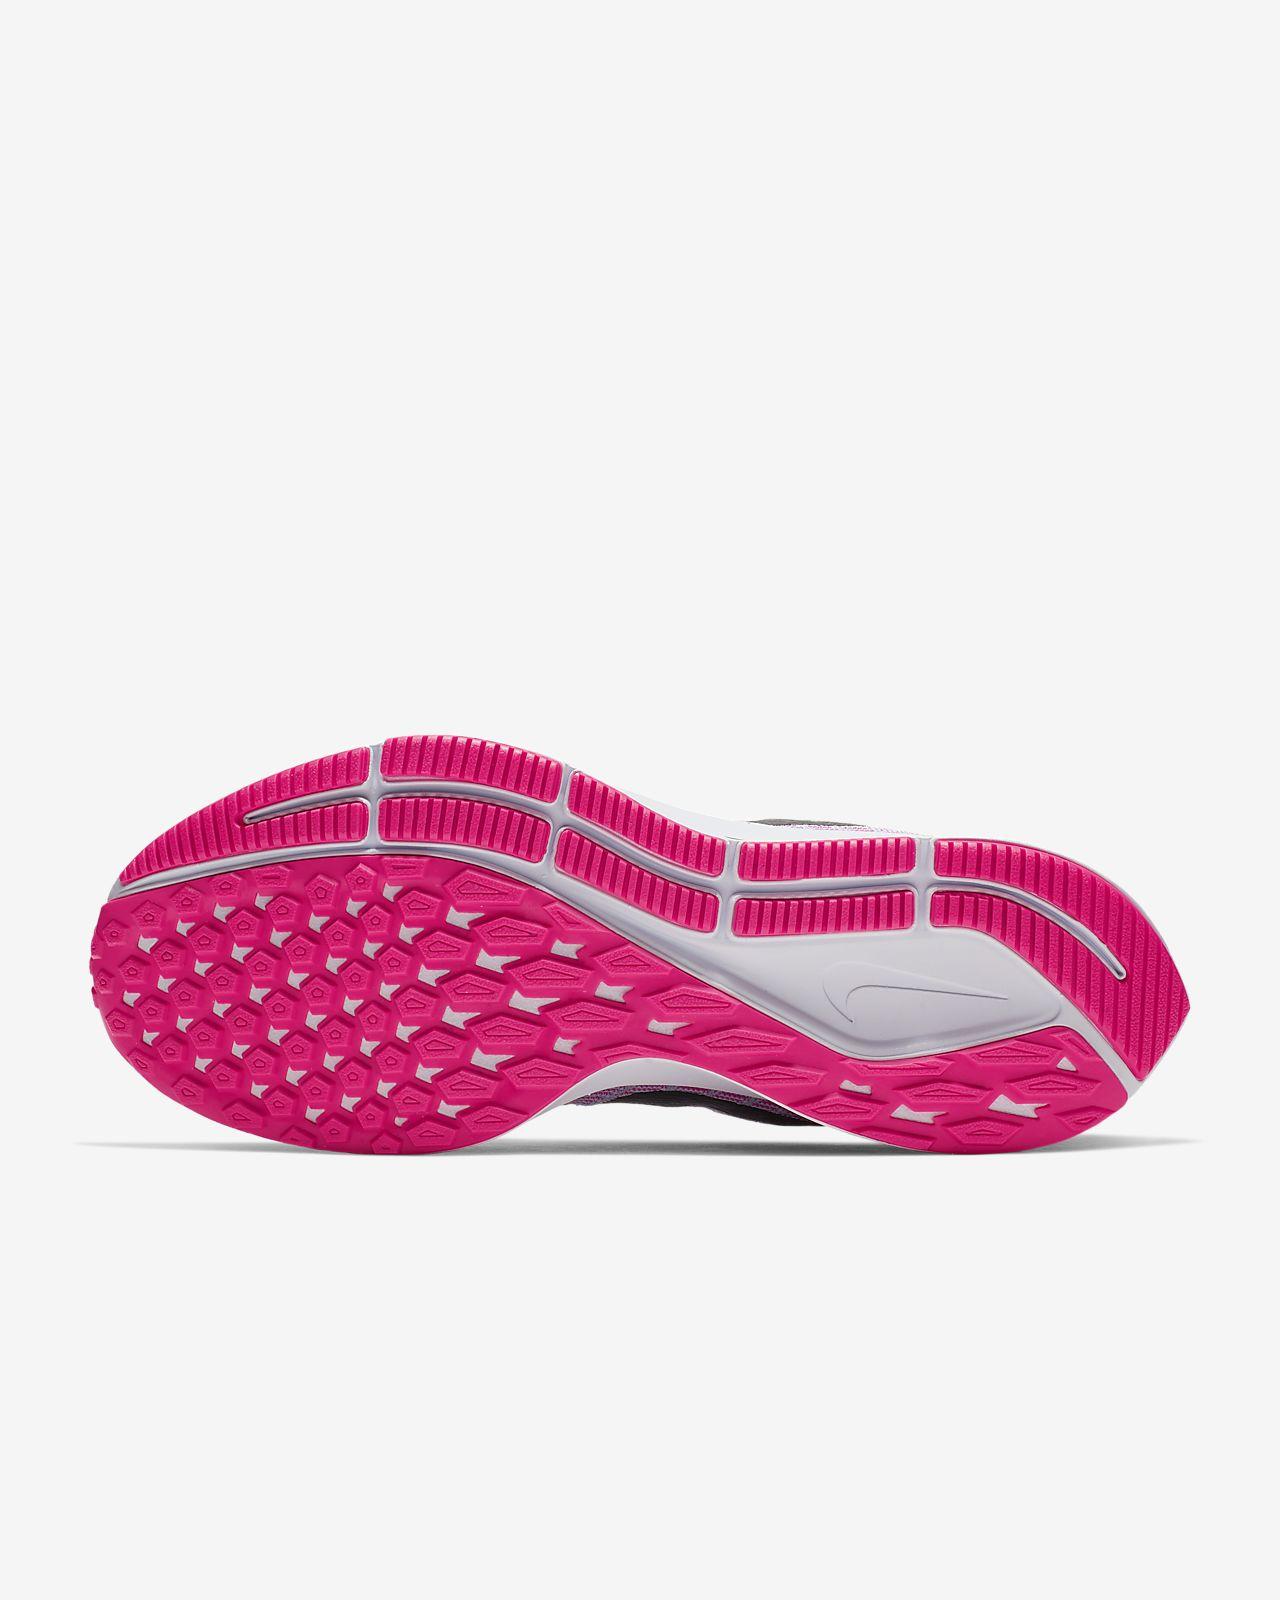 9af566a8 Nike Air Zoom Pegasus 35 Women's Running Shoe. Nike.com